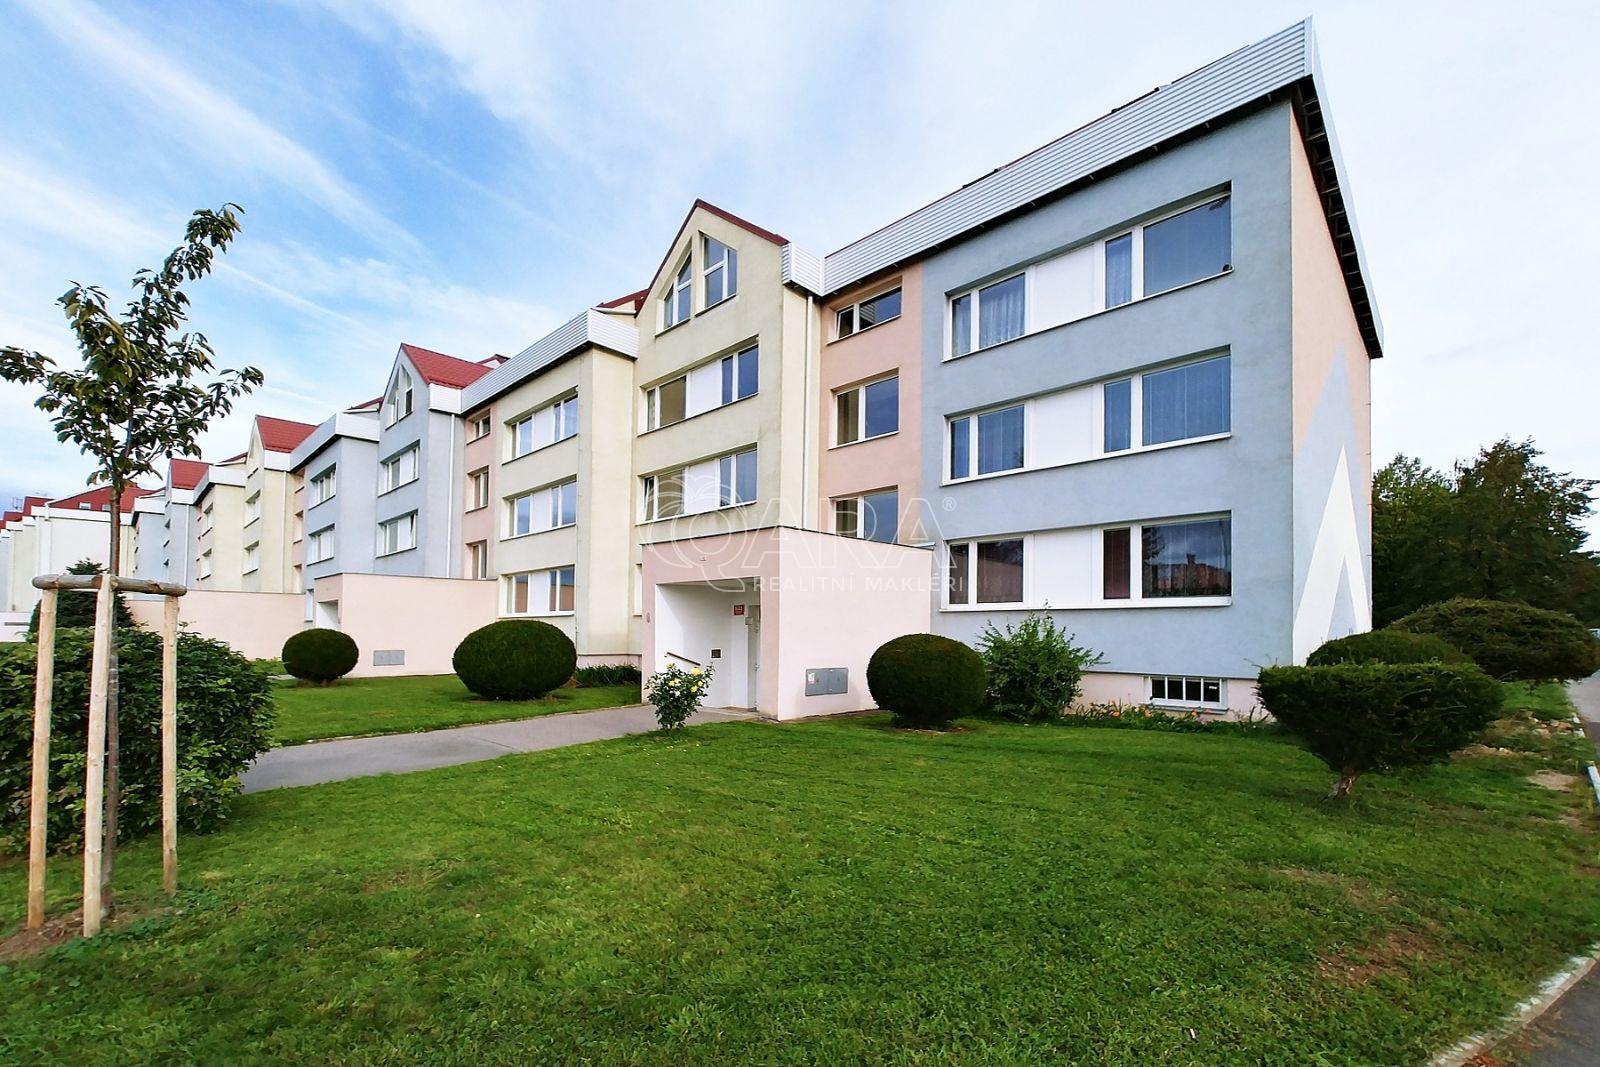 Prodej bytu 5+kk/T, 119 m2, Praha 9 – Újezd nad Lesy, 3. patro, mezonet